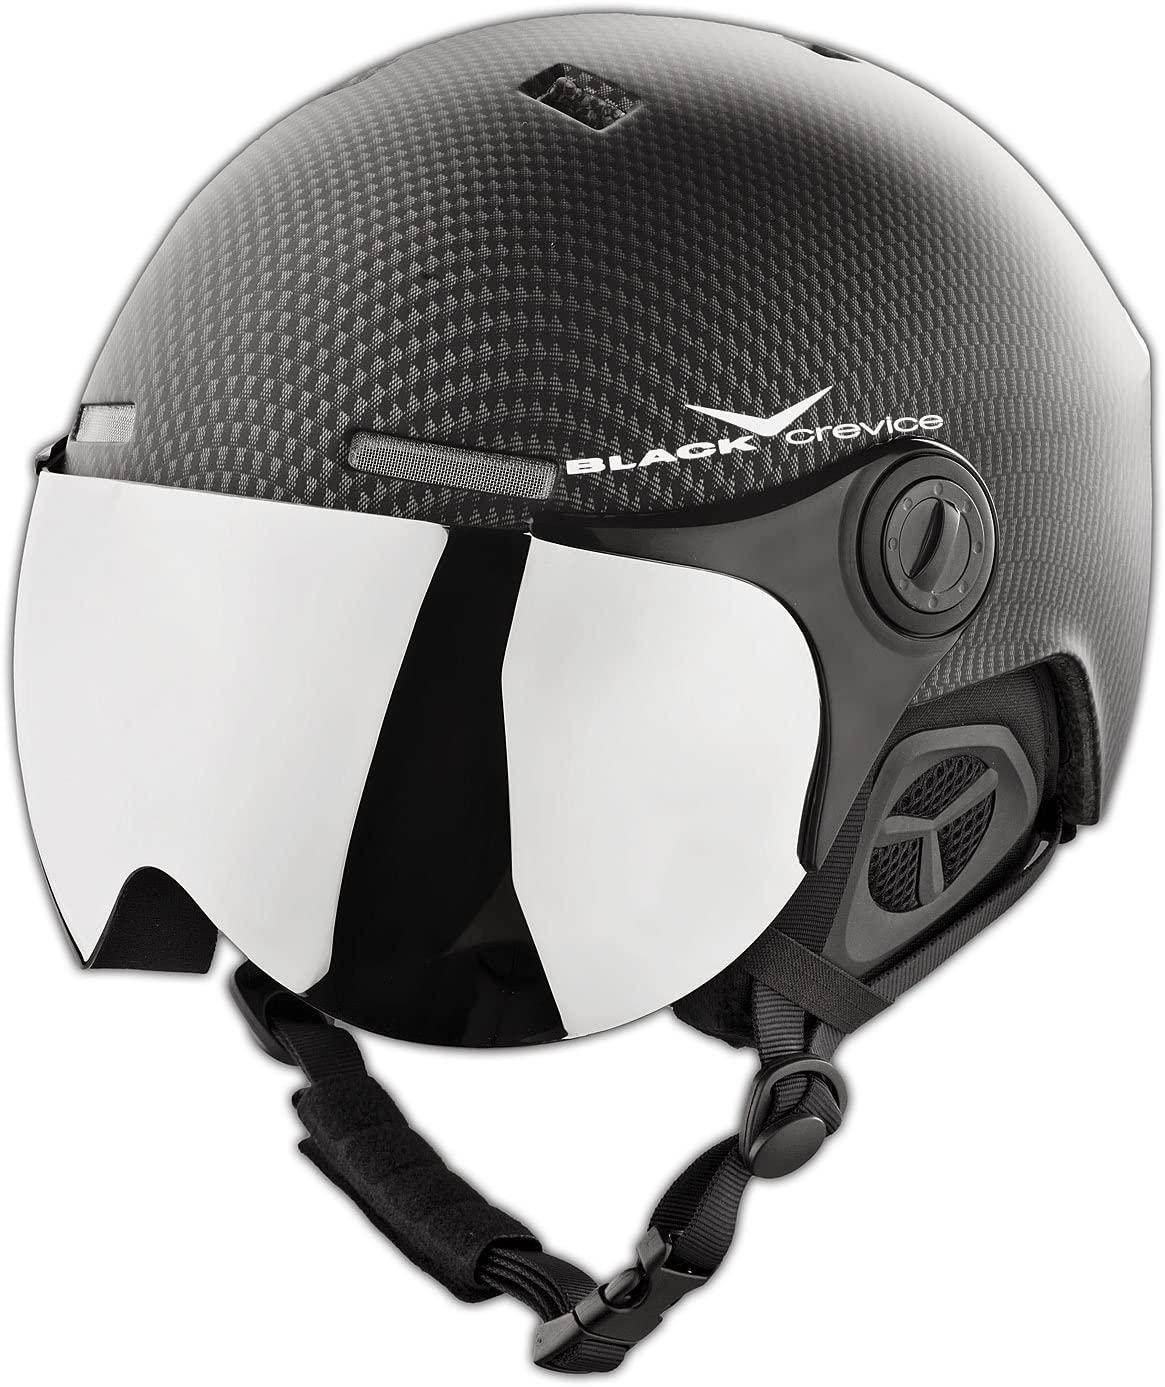 Black Crevice Ski Helmet